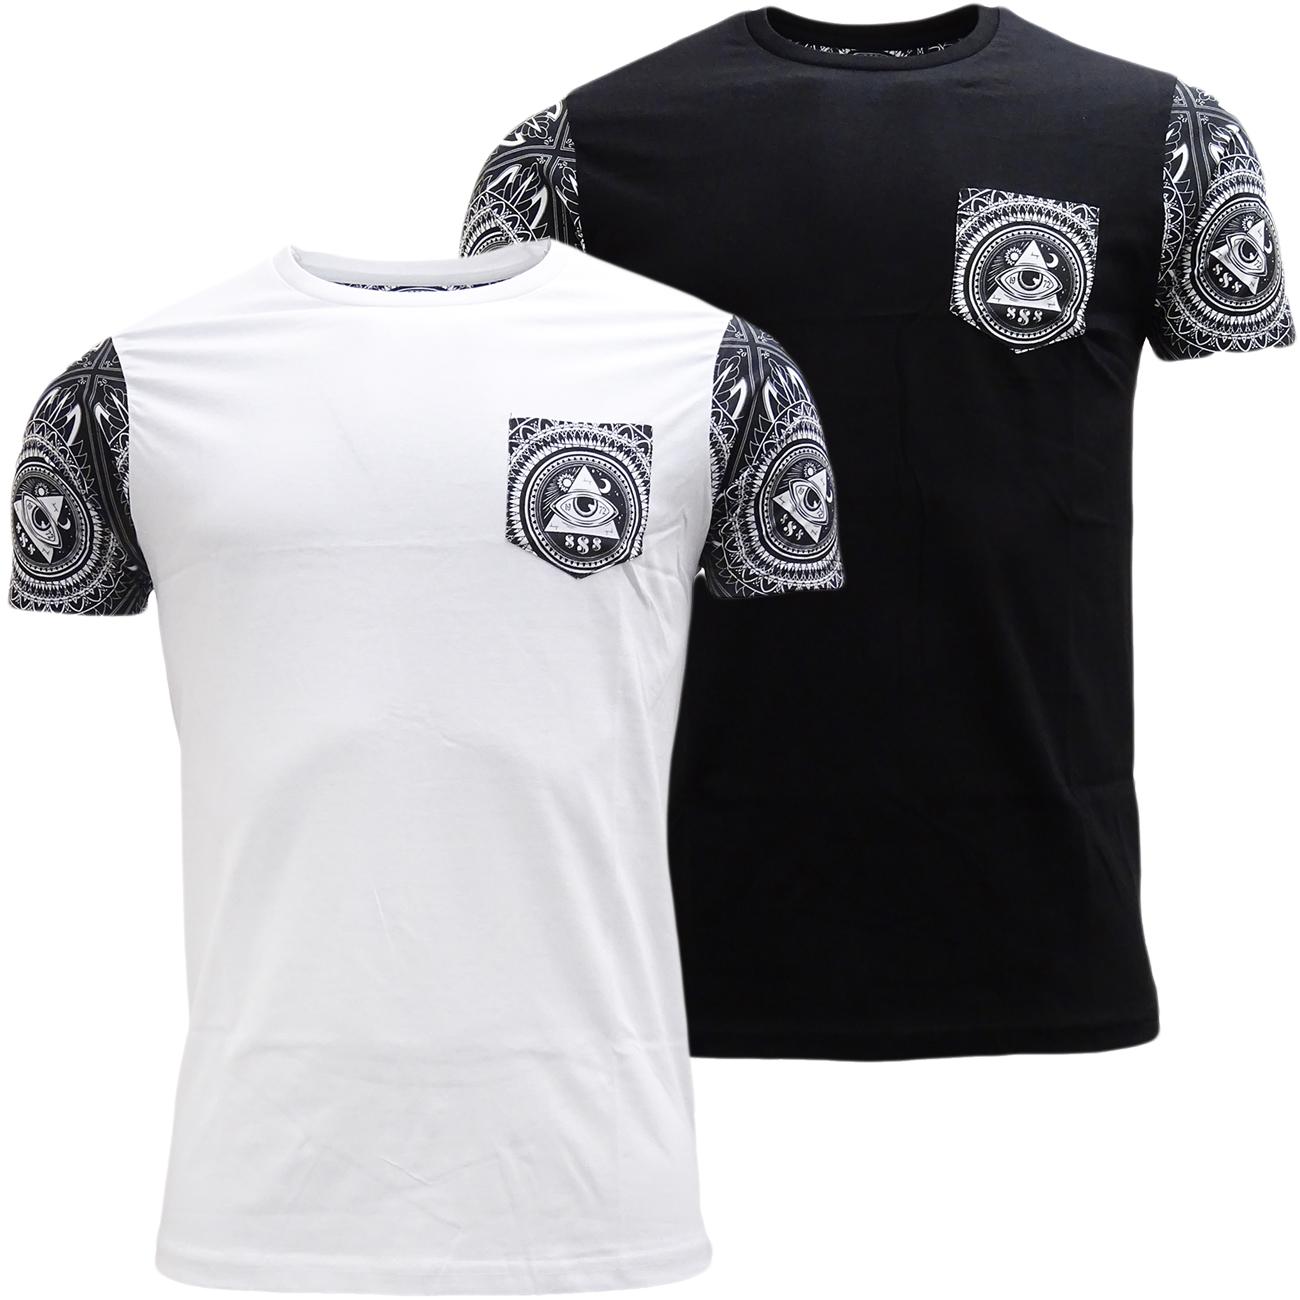 Brave Soul Short Sleeve T-Shirt 'Limonov'